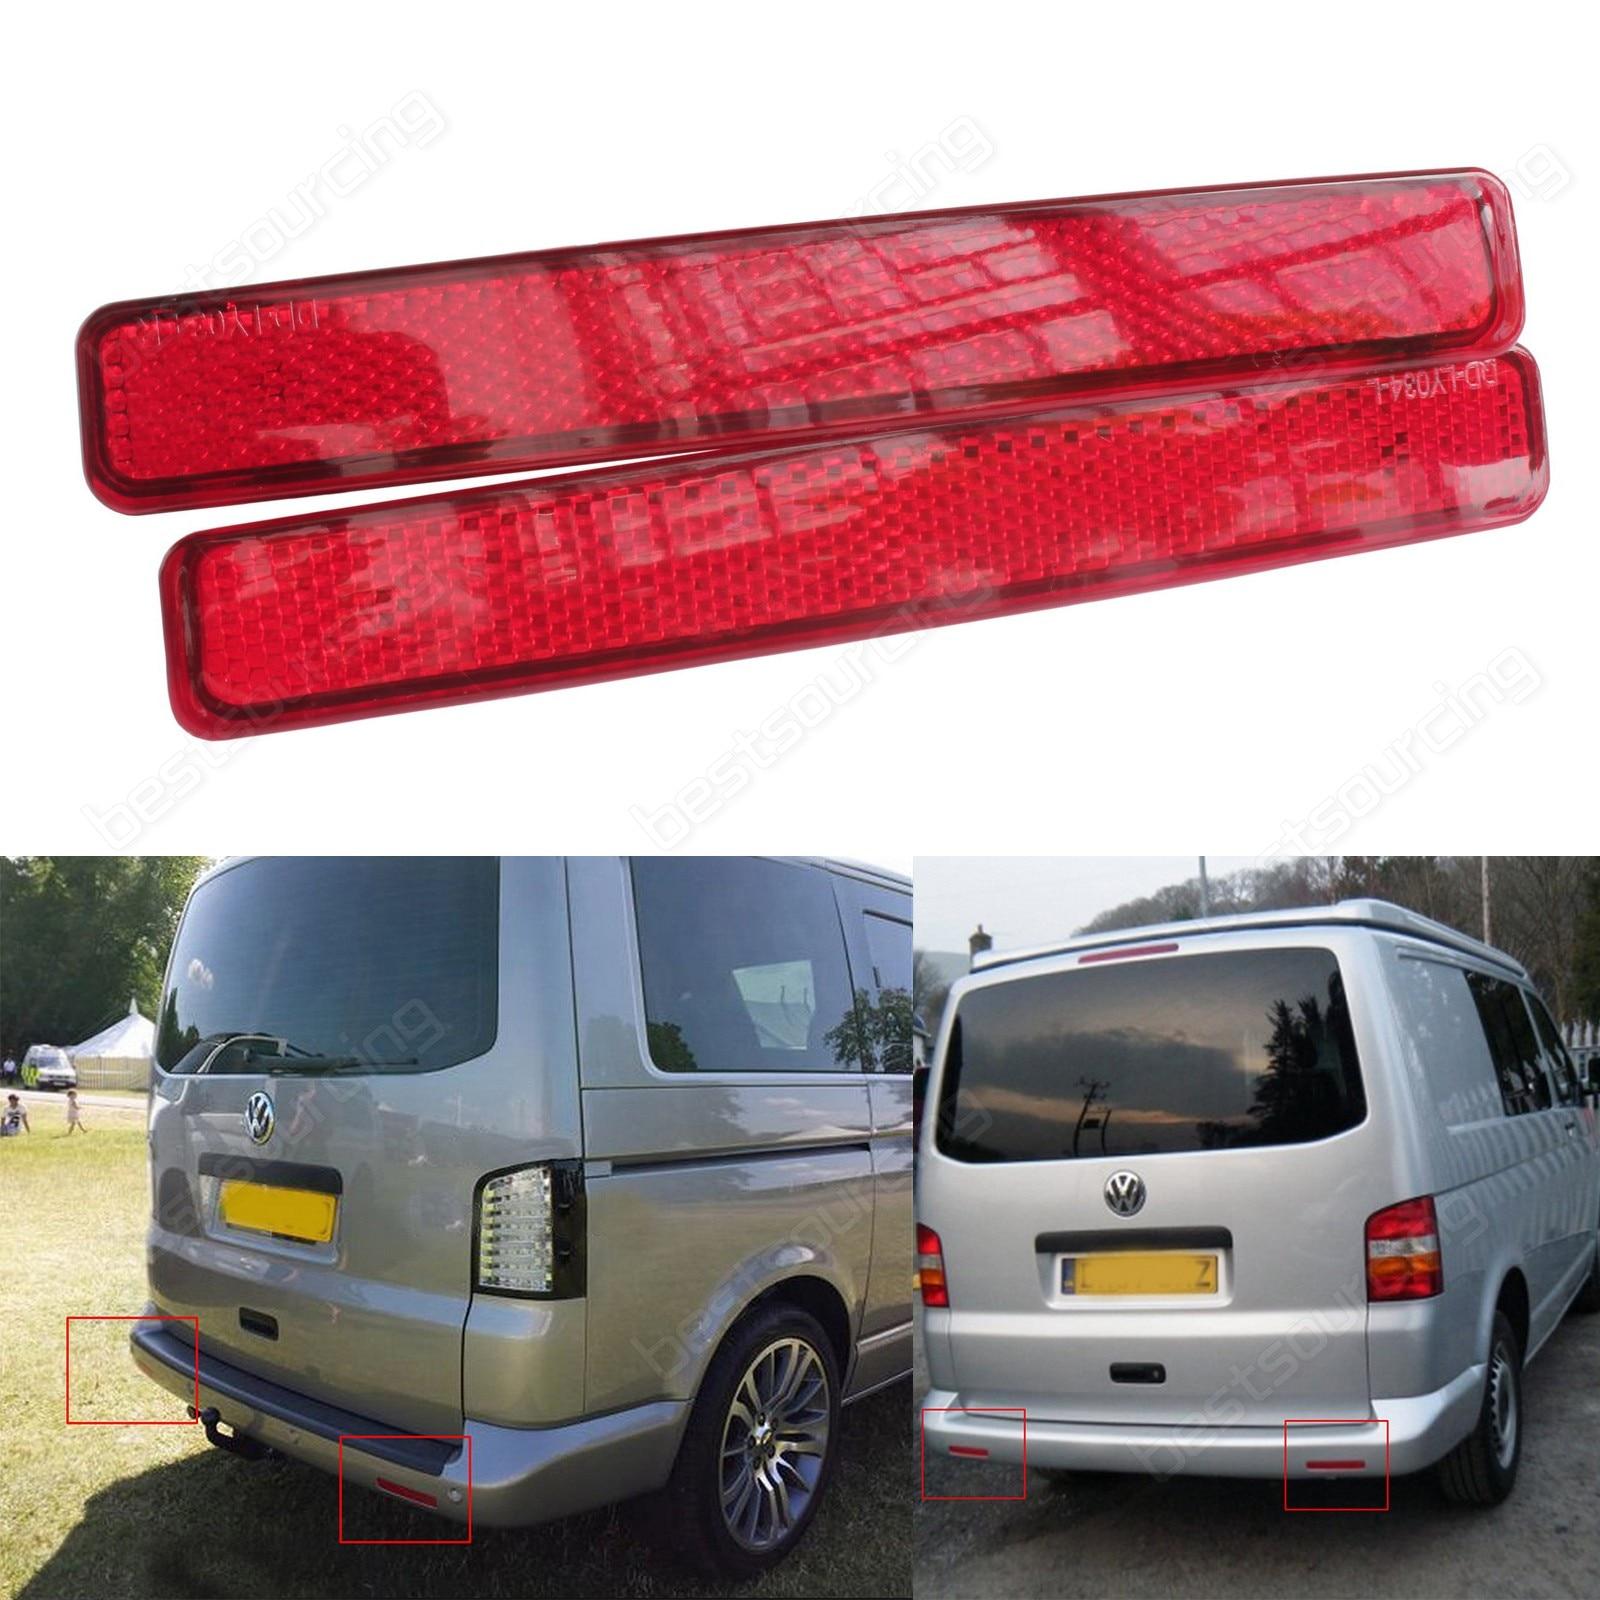 ANGRONG 2x For VW Transporter T5 2003-11 Multivan Red Rear Bumper Reflector Light Left Right